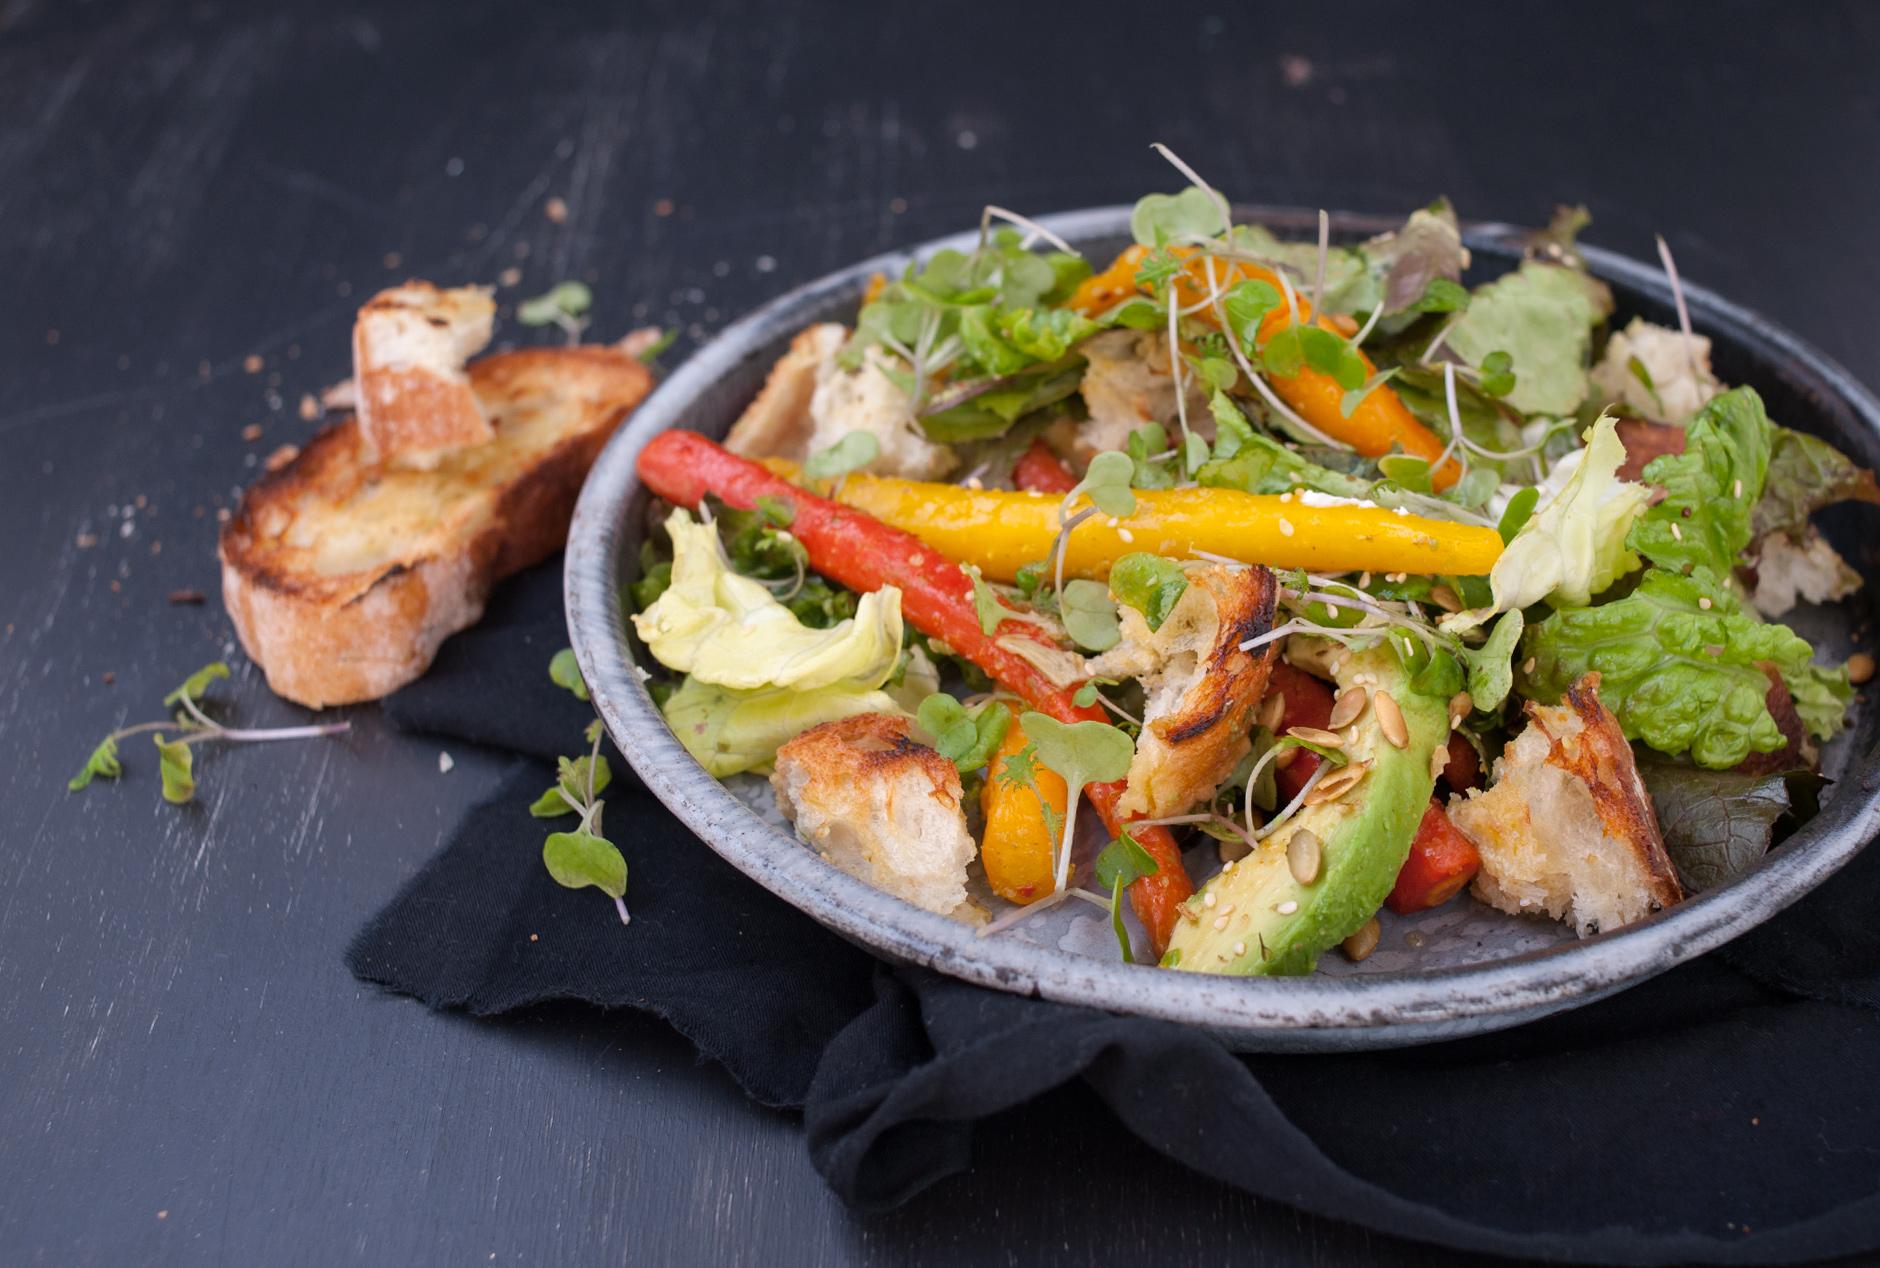 CarrotSalad_food_photography_4.jpg